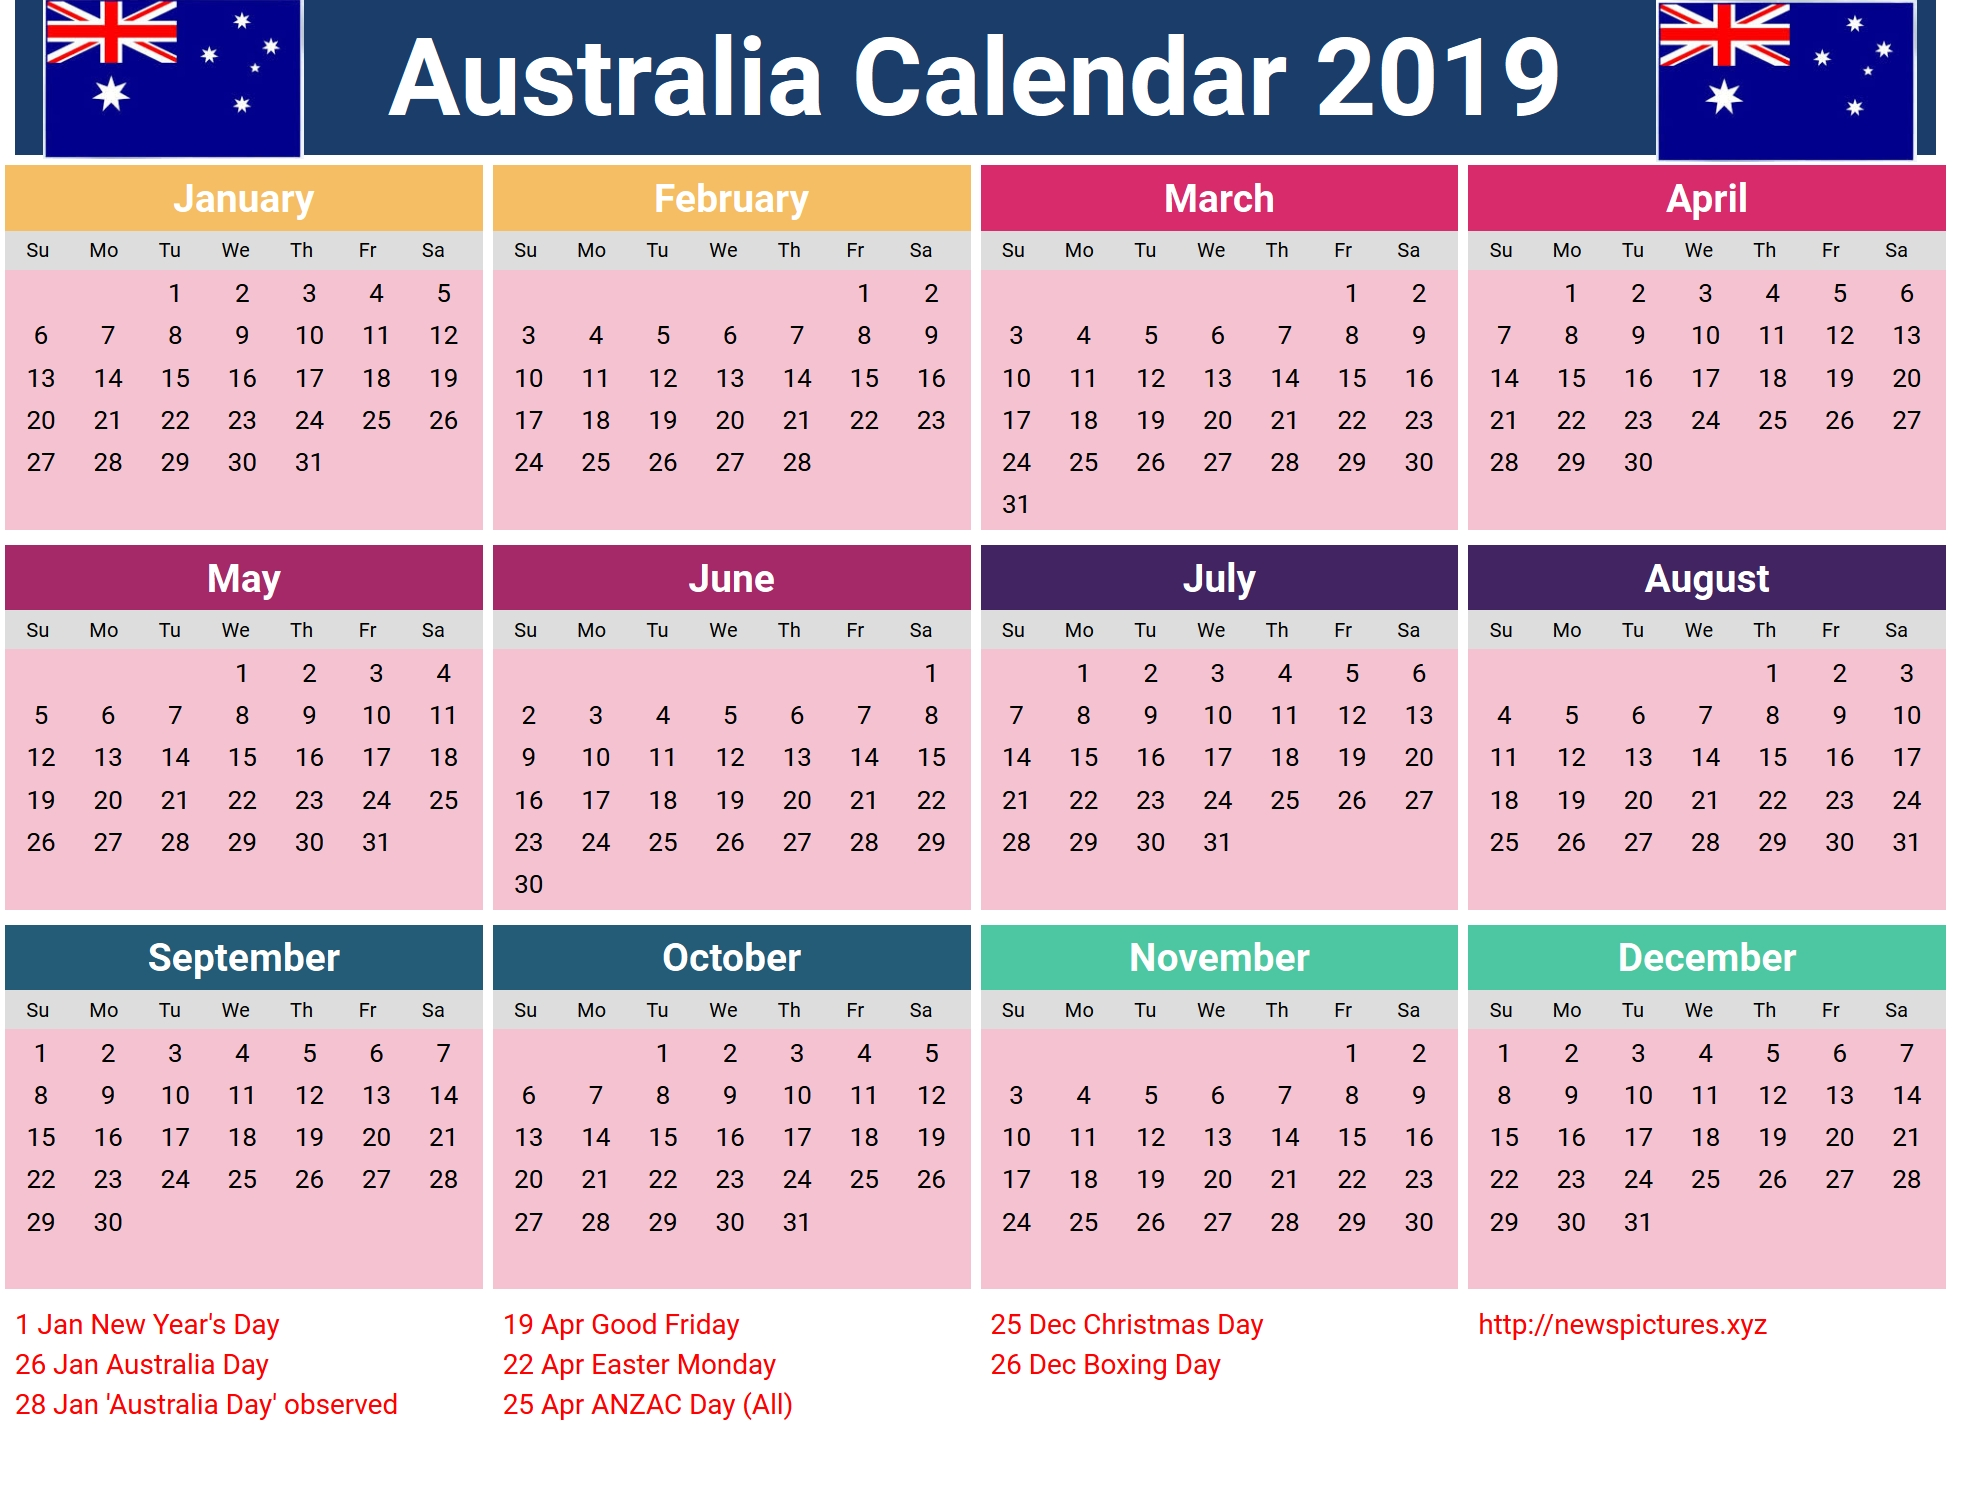 Year 2019 Calendar Australia School Nsw - Littledelhisf Calendar Year 2019 Australia